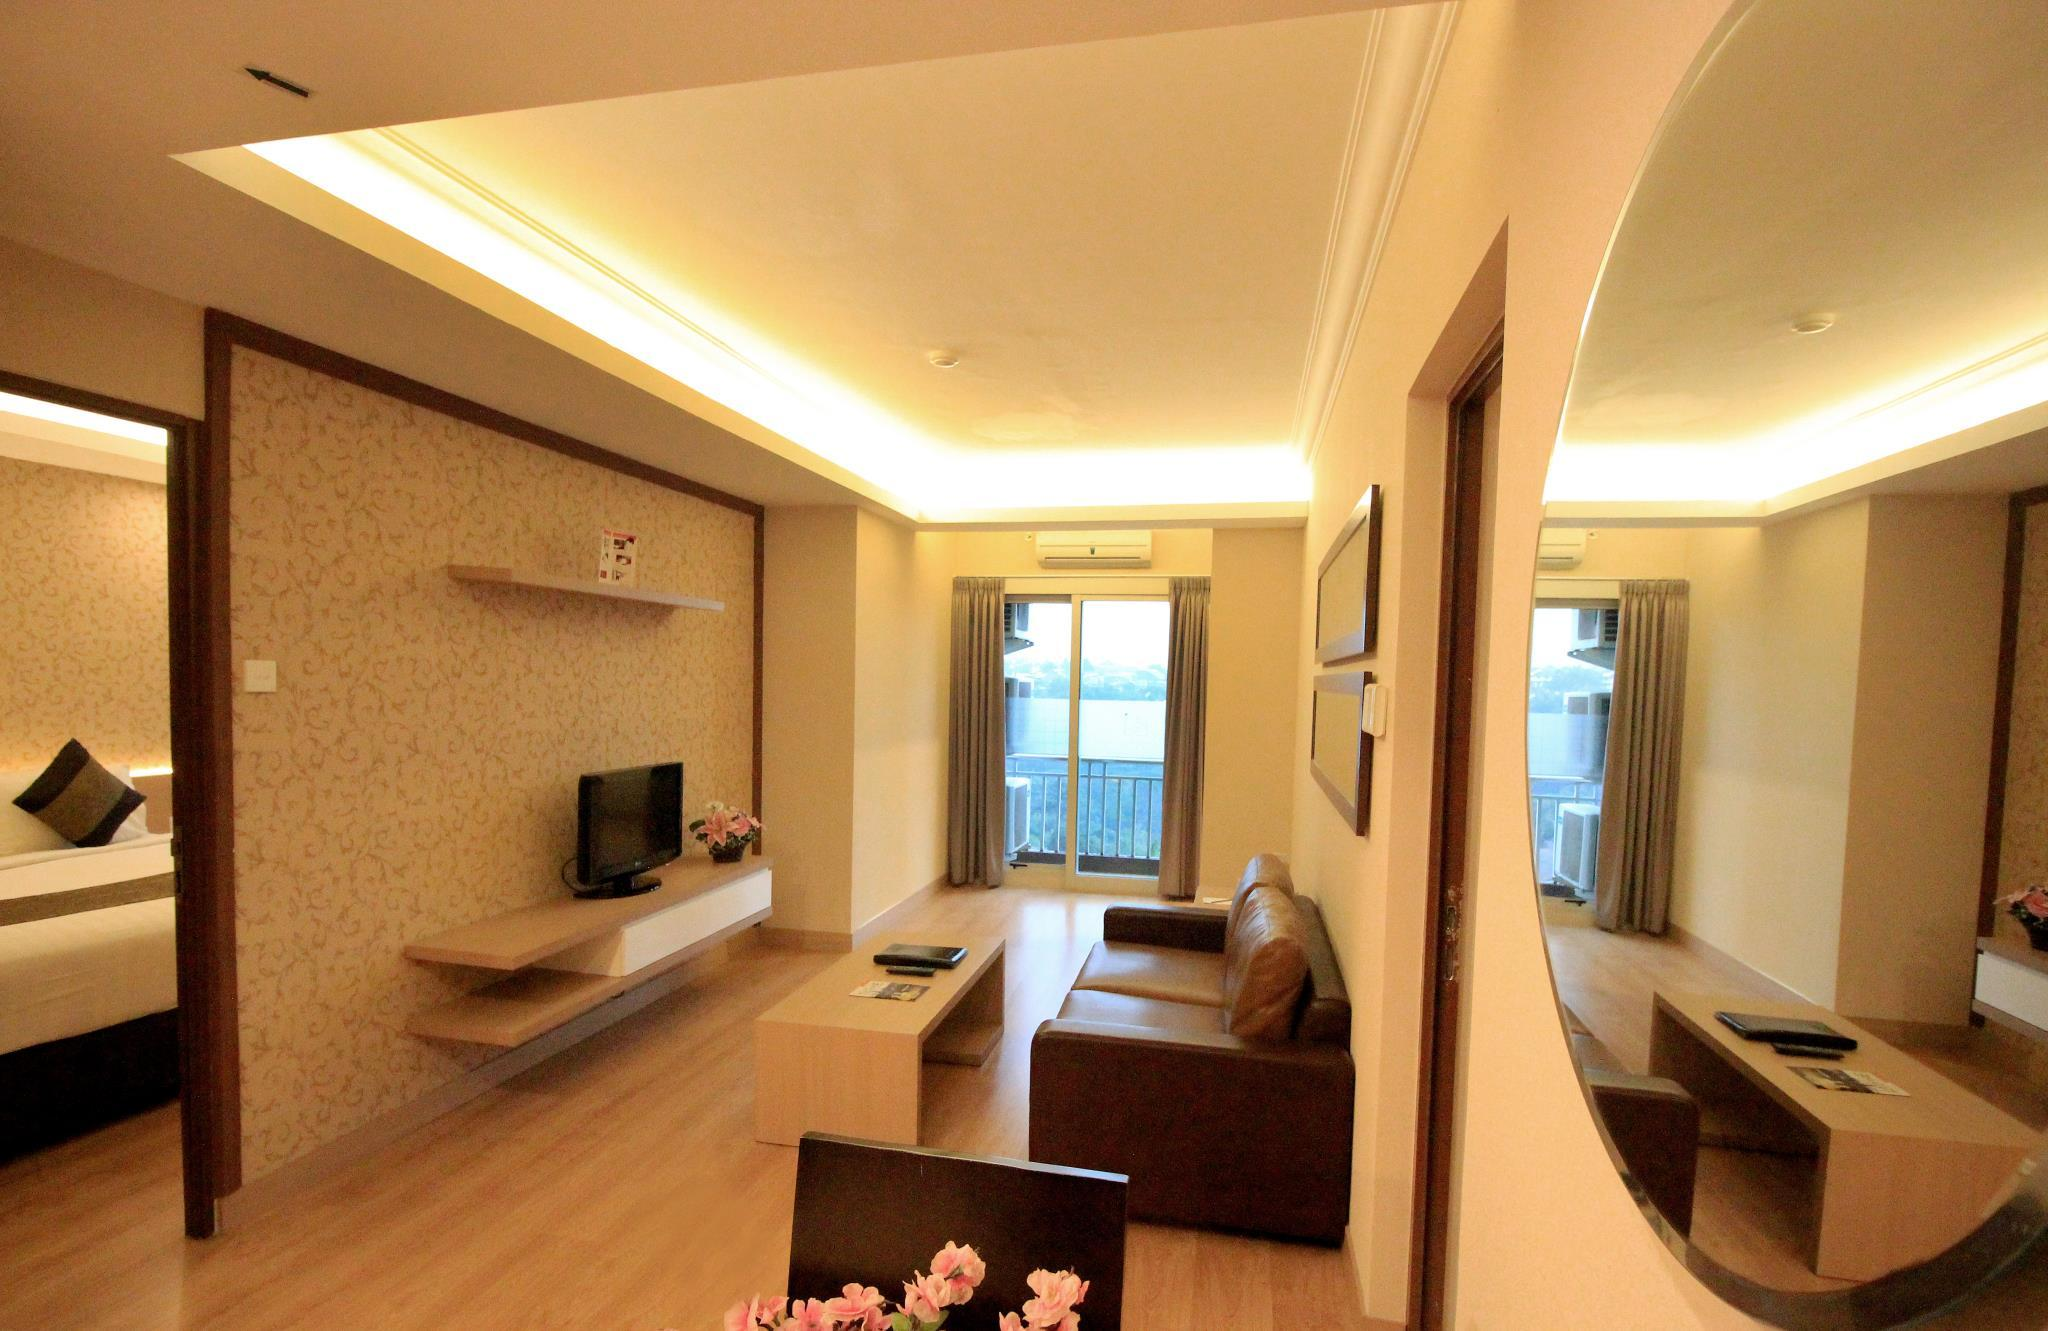 Galeri Ciumbuleuit and Apartment